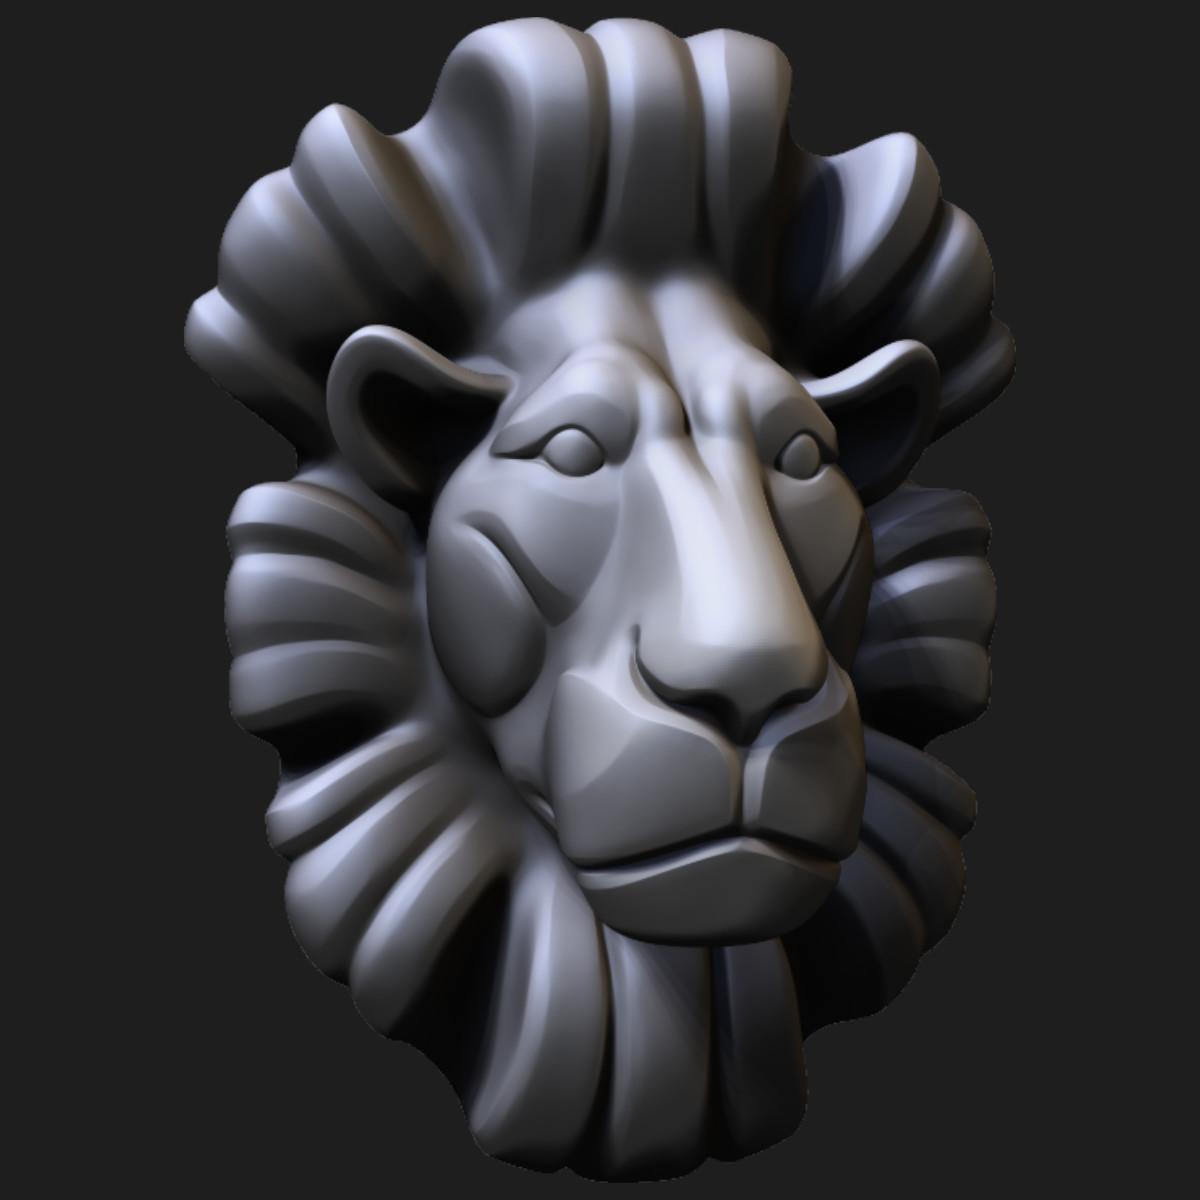 Dian mozokov lionbust